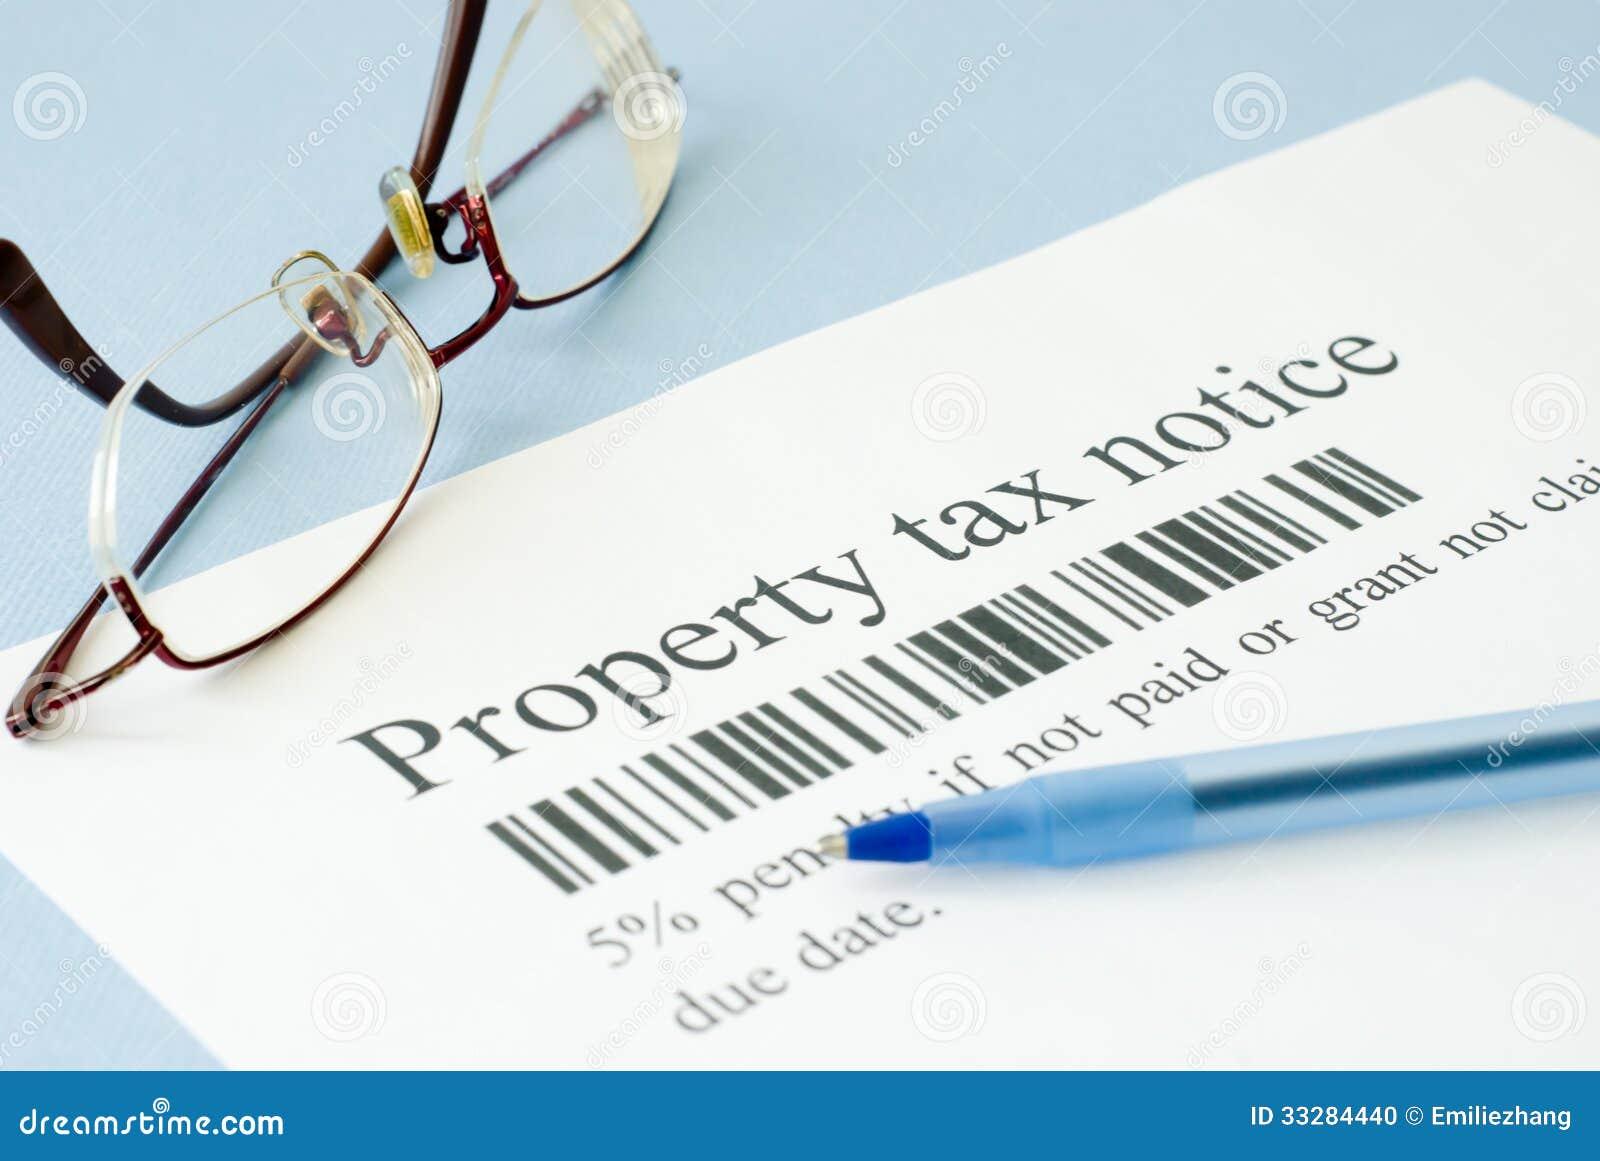 Property Tax Notice Stock Photo - Image: 33284440